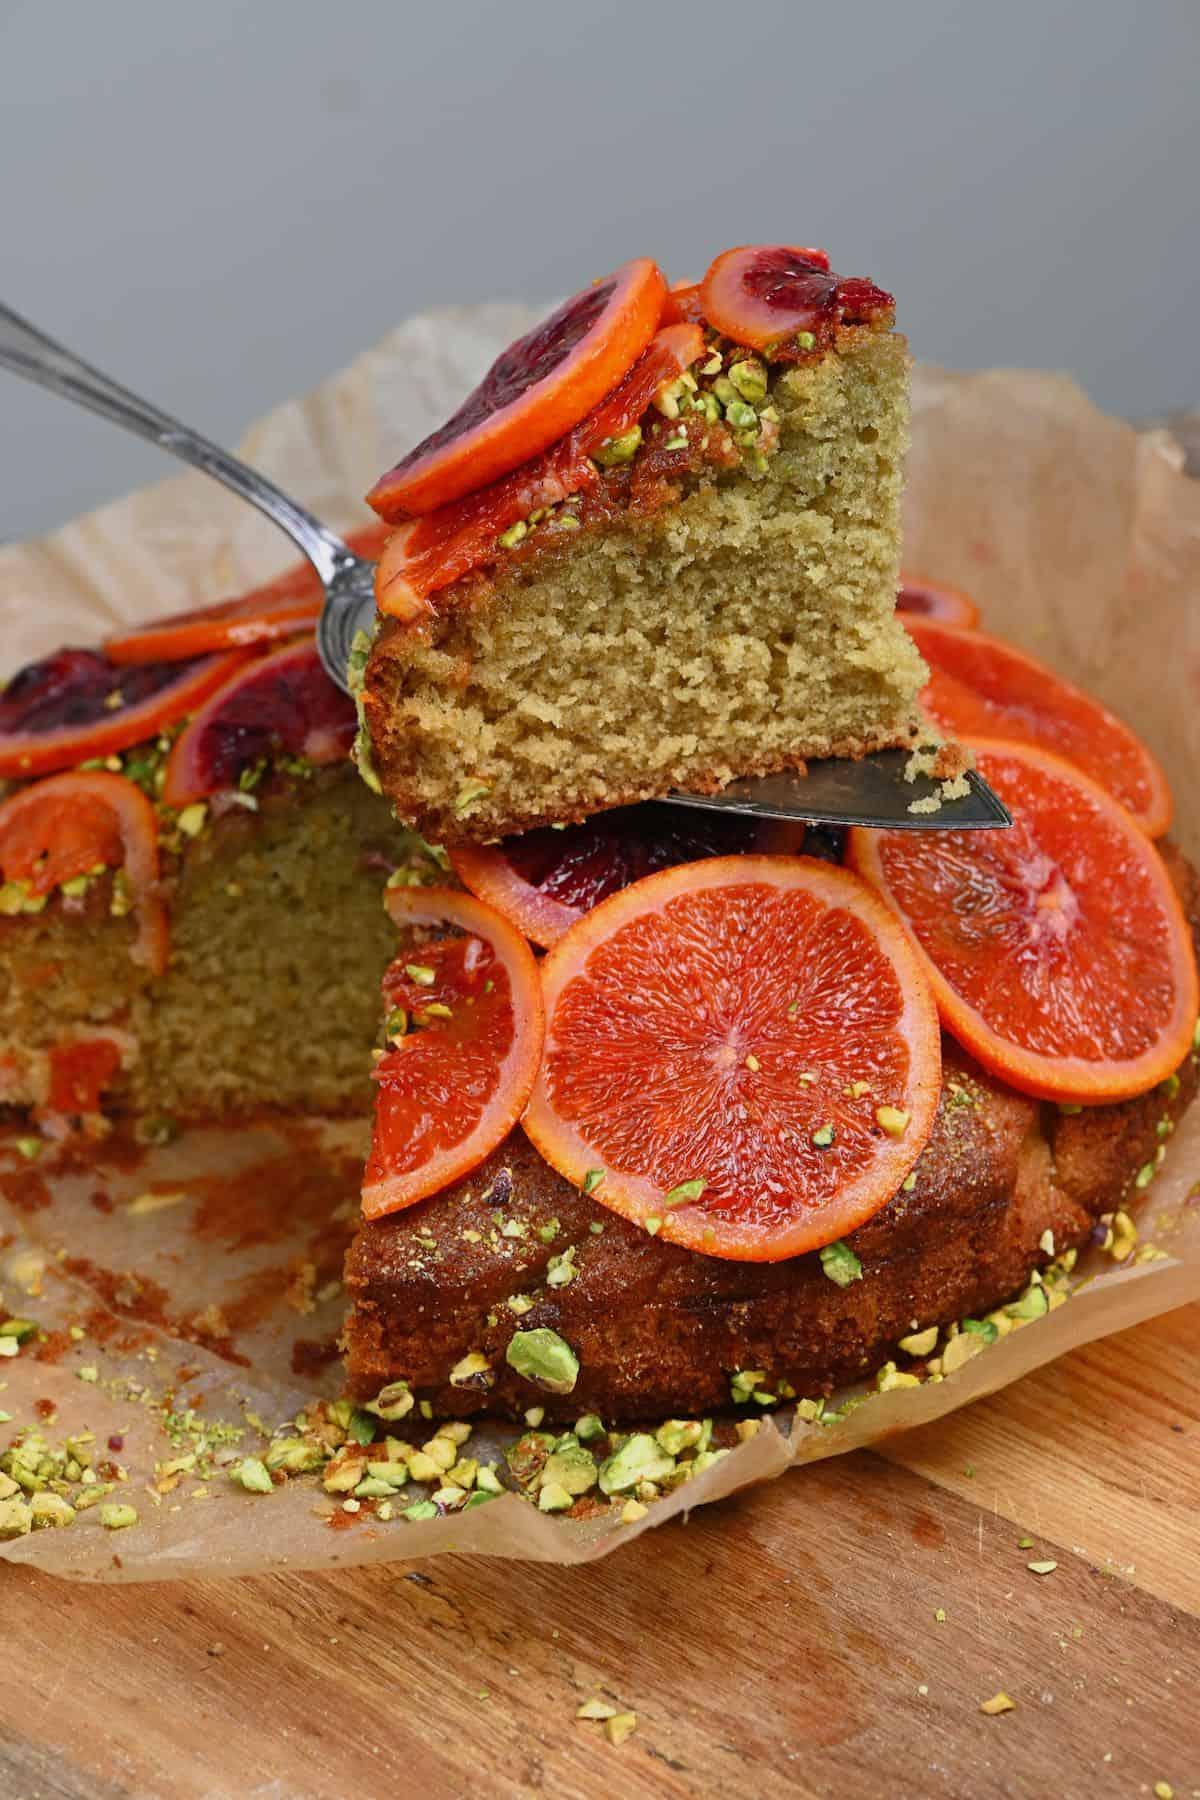 A slice of orange cake on top of the cake